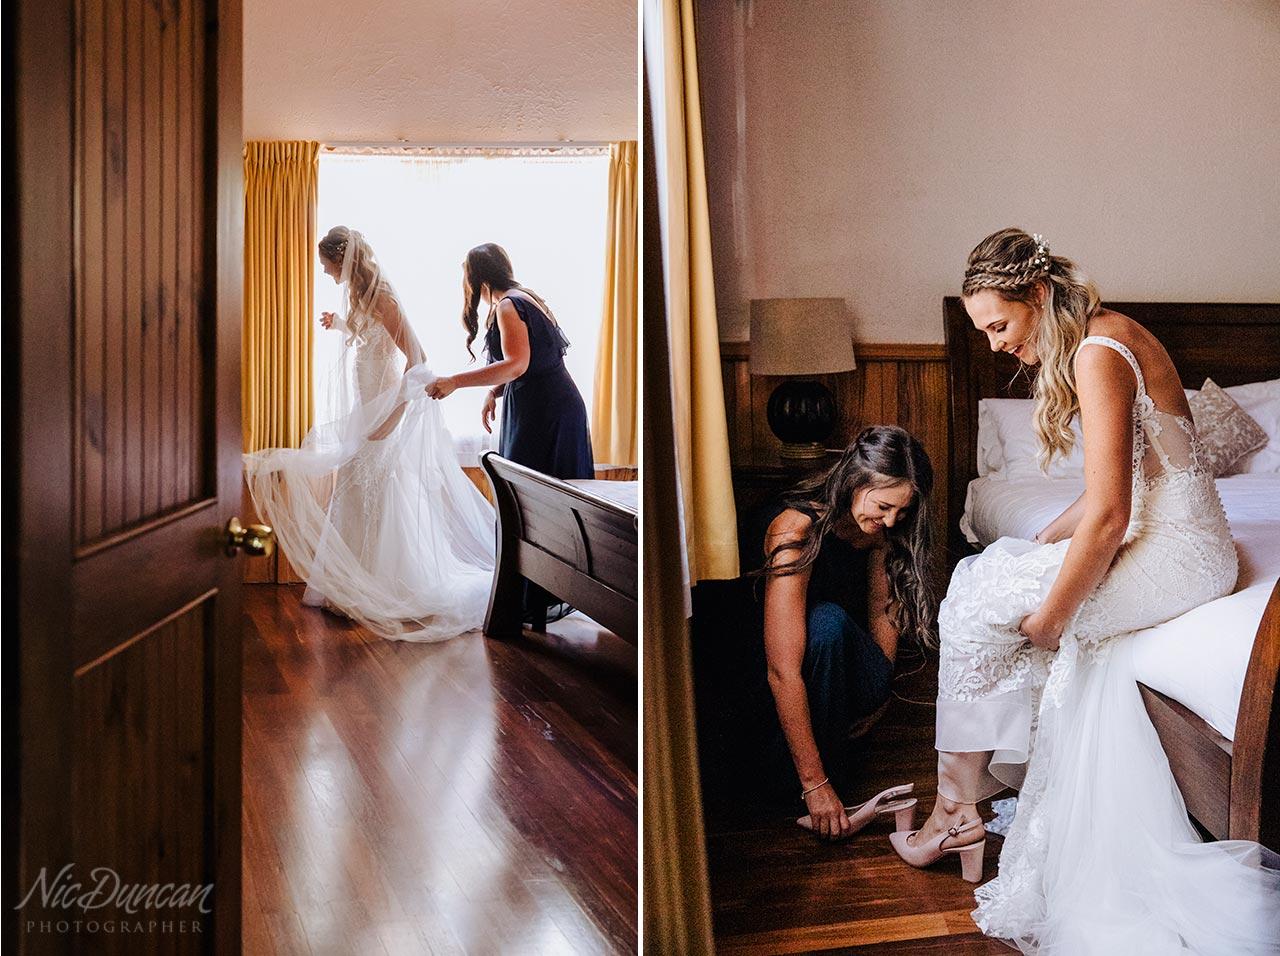 Bride getting ready for her wedding in Denmark, Western Australia